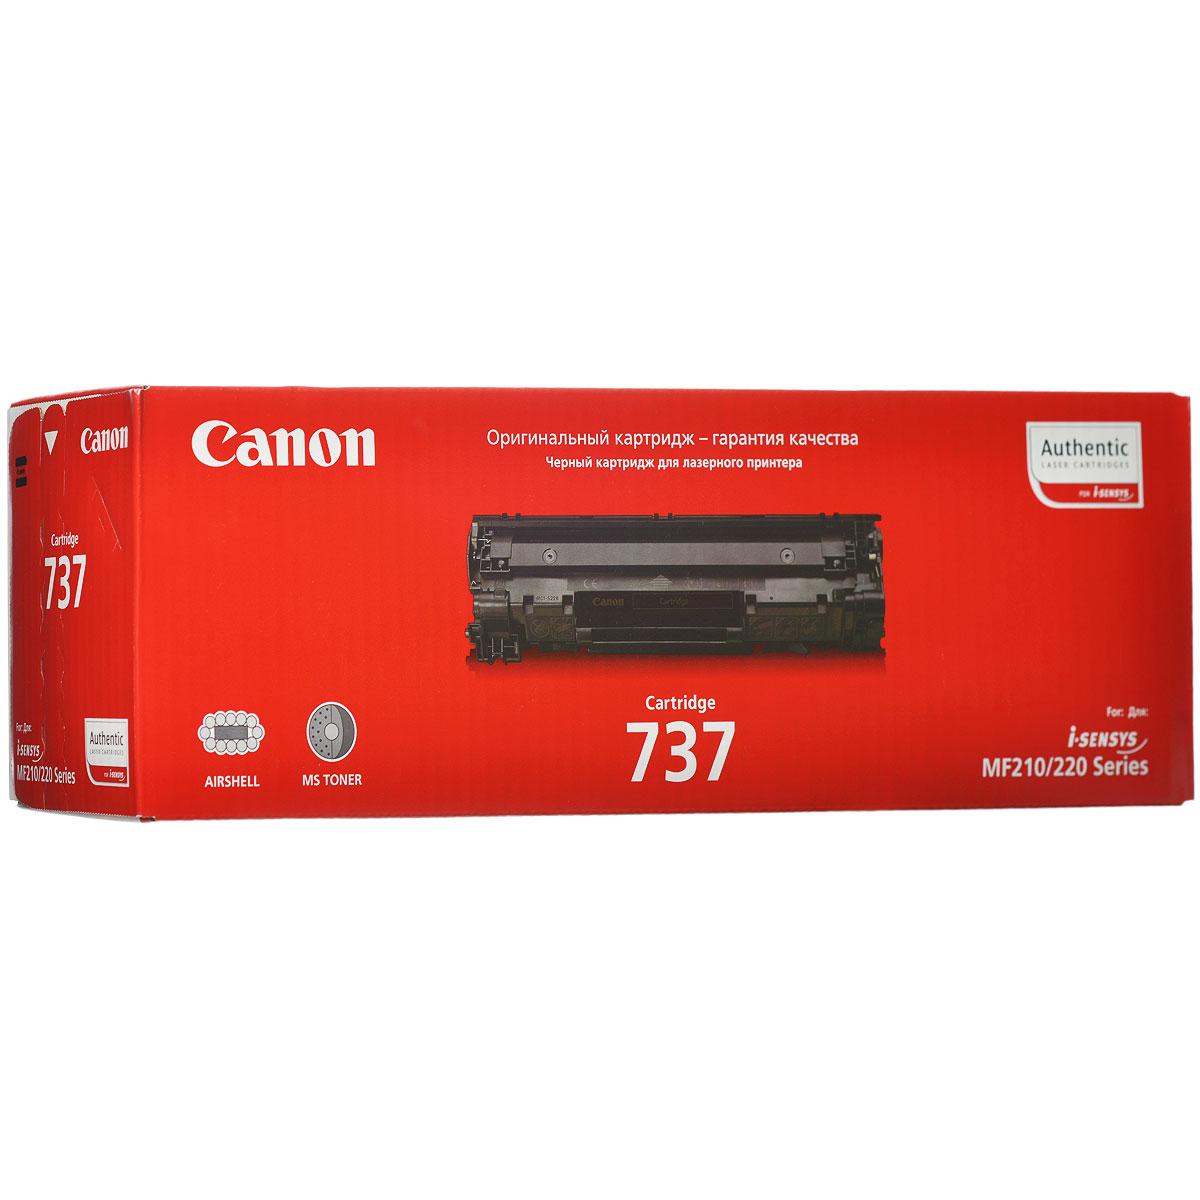 Canon 737 (9435B004) тонер-картридж для Canon MF 211/212w/216n/217w/226dn/229dw принтер canon i sensys colour lbp653cdw лазерный цвет белый [1476c006]